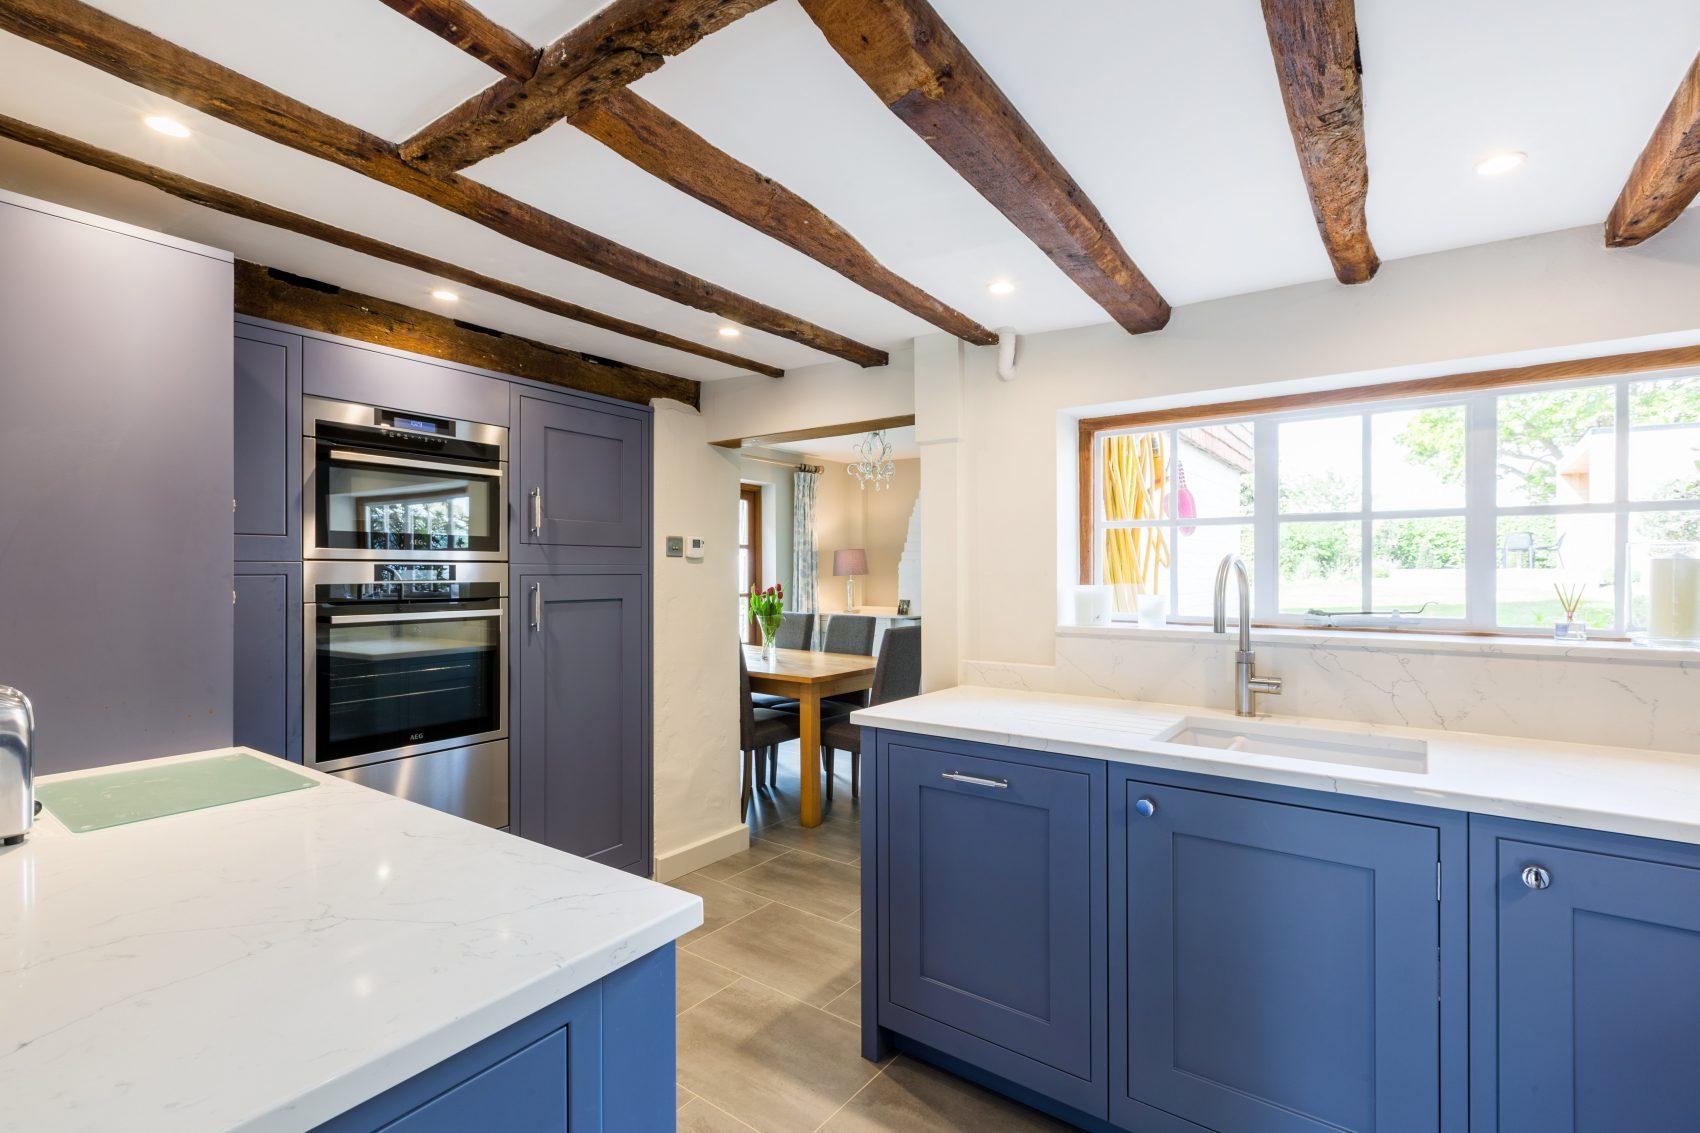 shaker kitchen design for period cottage